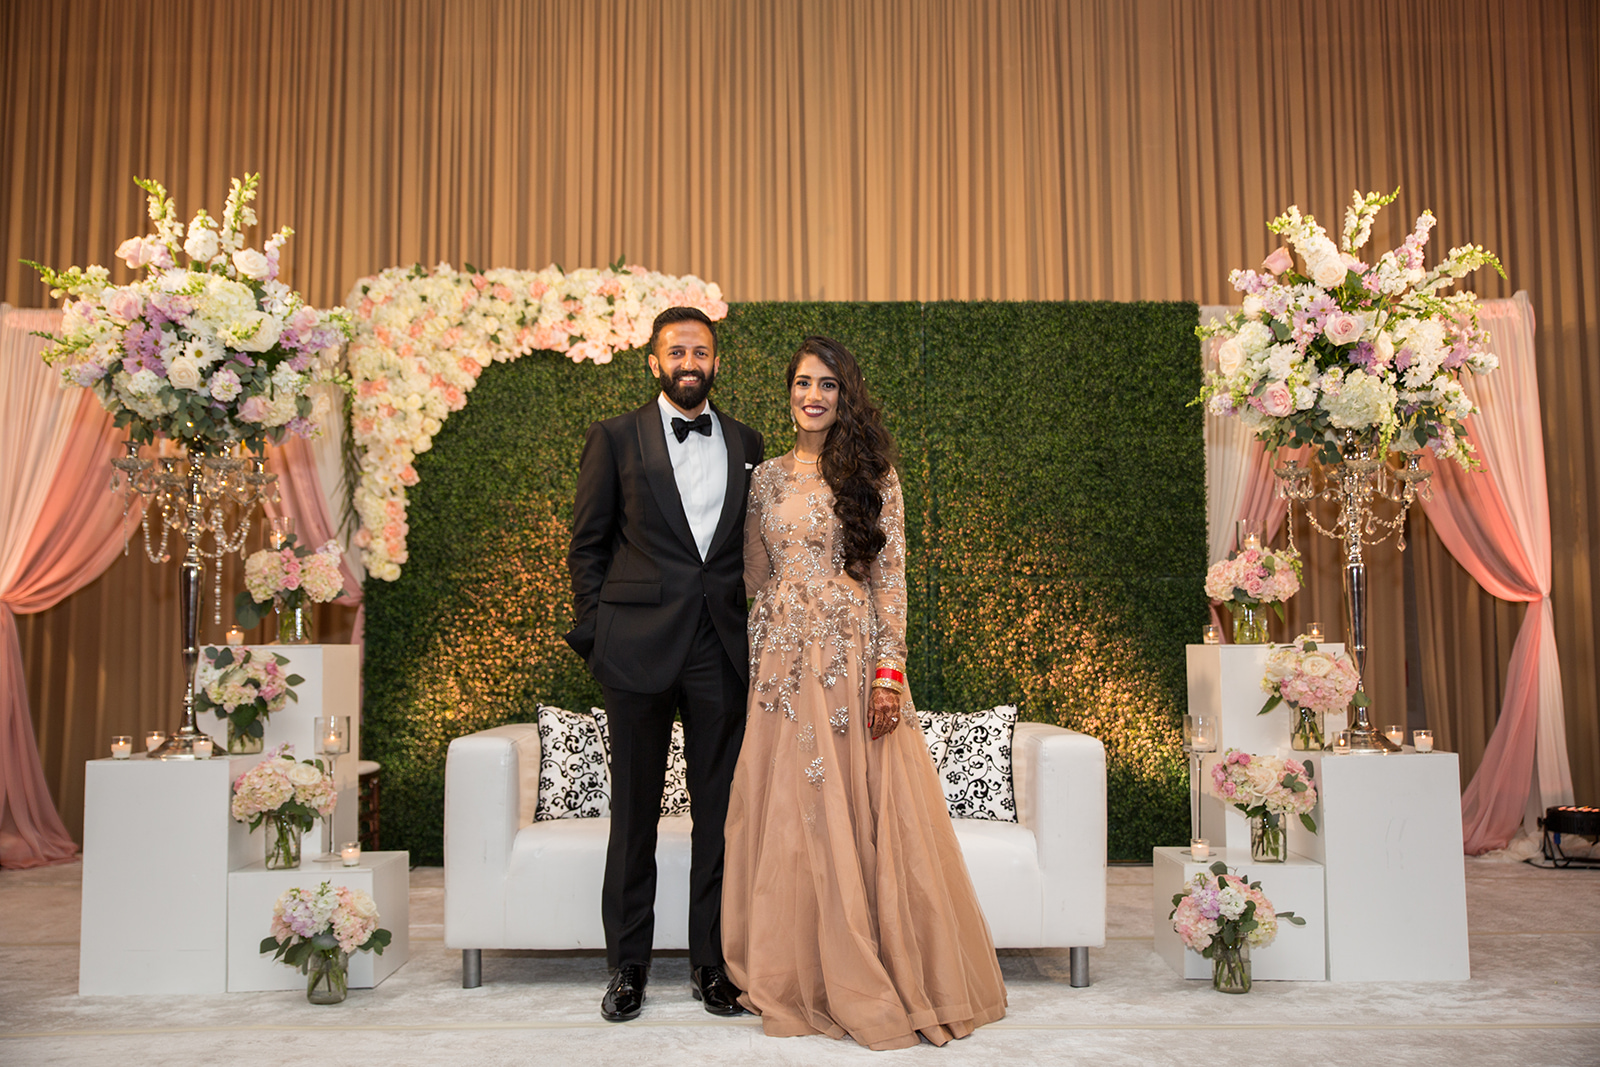 Le Cape Weddings - Sumeet and Chavi - Reception Family Formals   -1.jpg